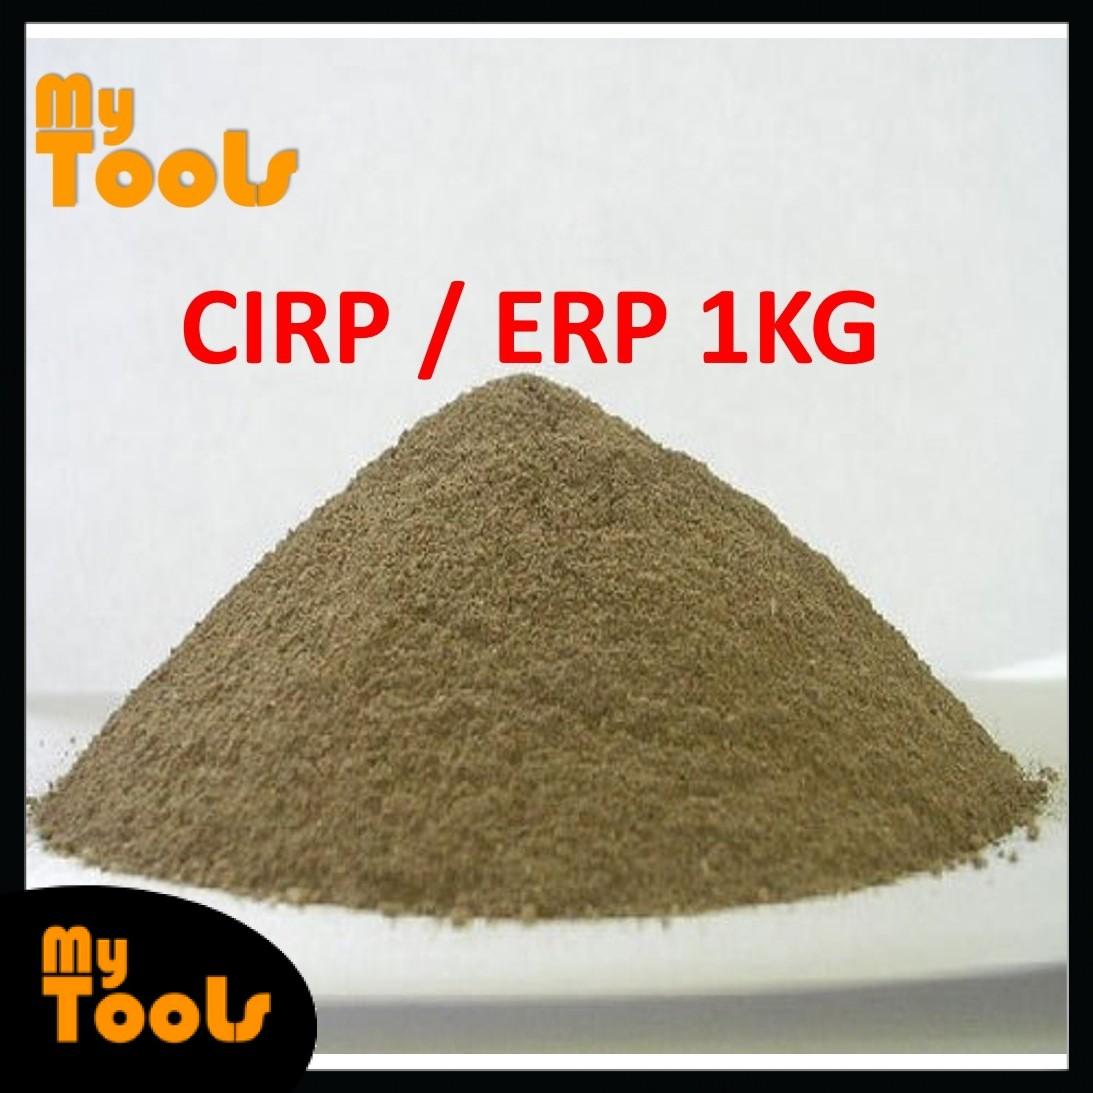 Mytools 1KG CIRP / ERP Christmas Island Rock Phosphate Egyptian Rock Phosphate Baja Akar